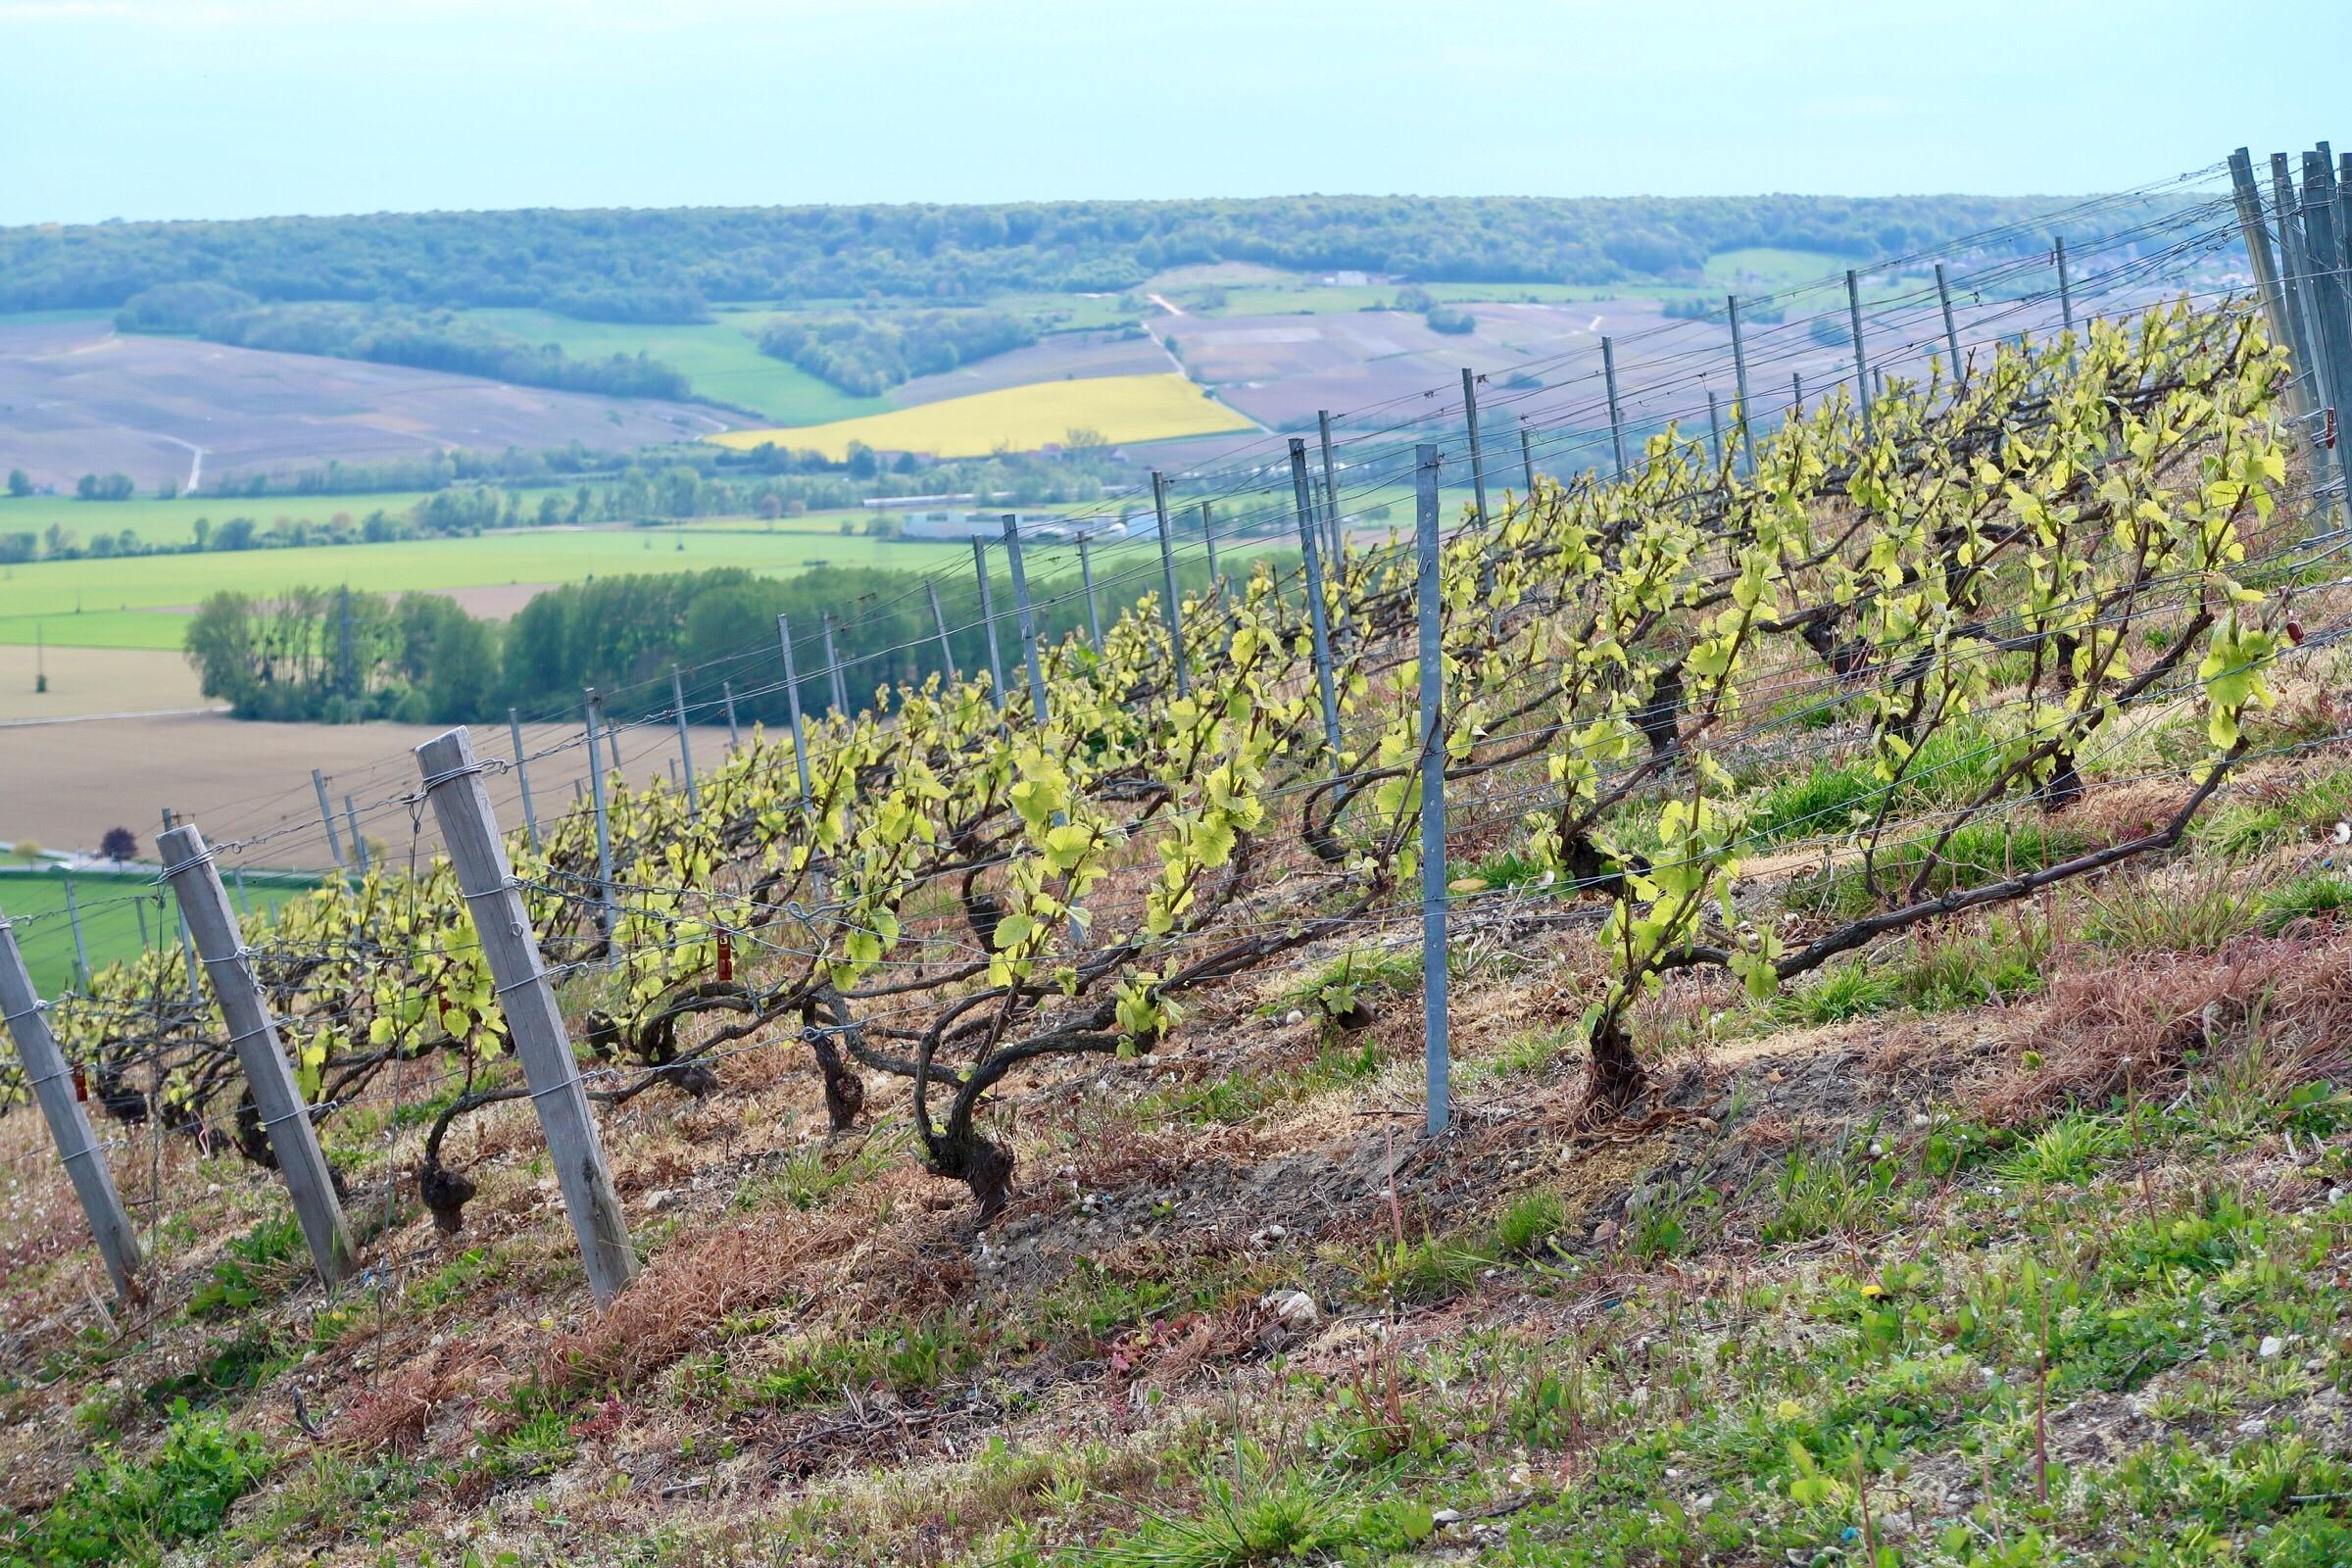 Hautvillers vines - where the process begins...